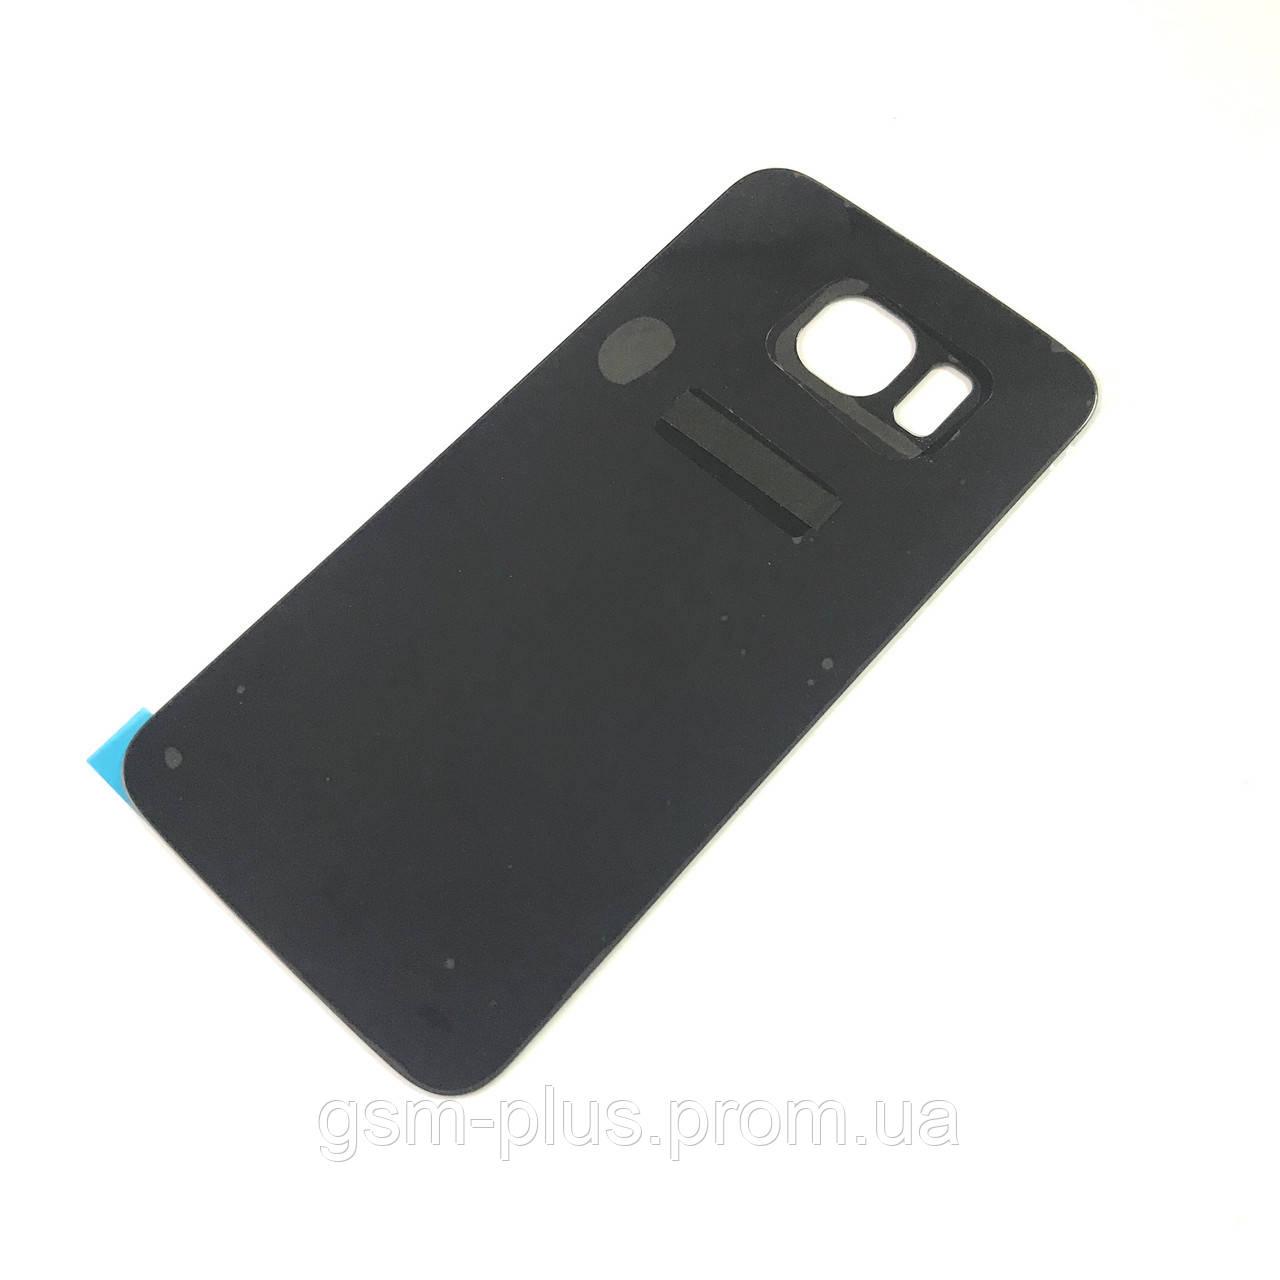 Задняя часть корпуса Samsung Galaxy S6 G920F (Blue)